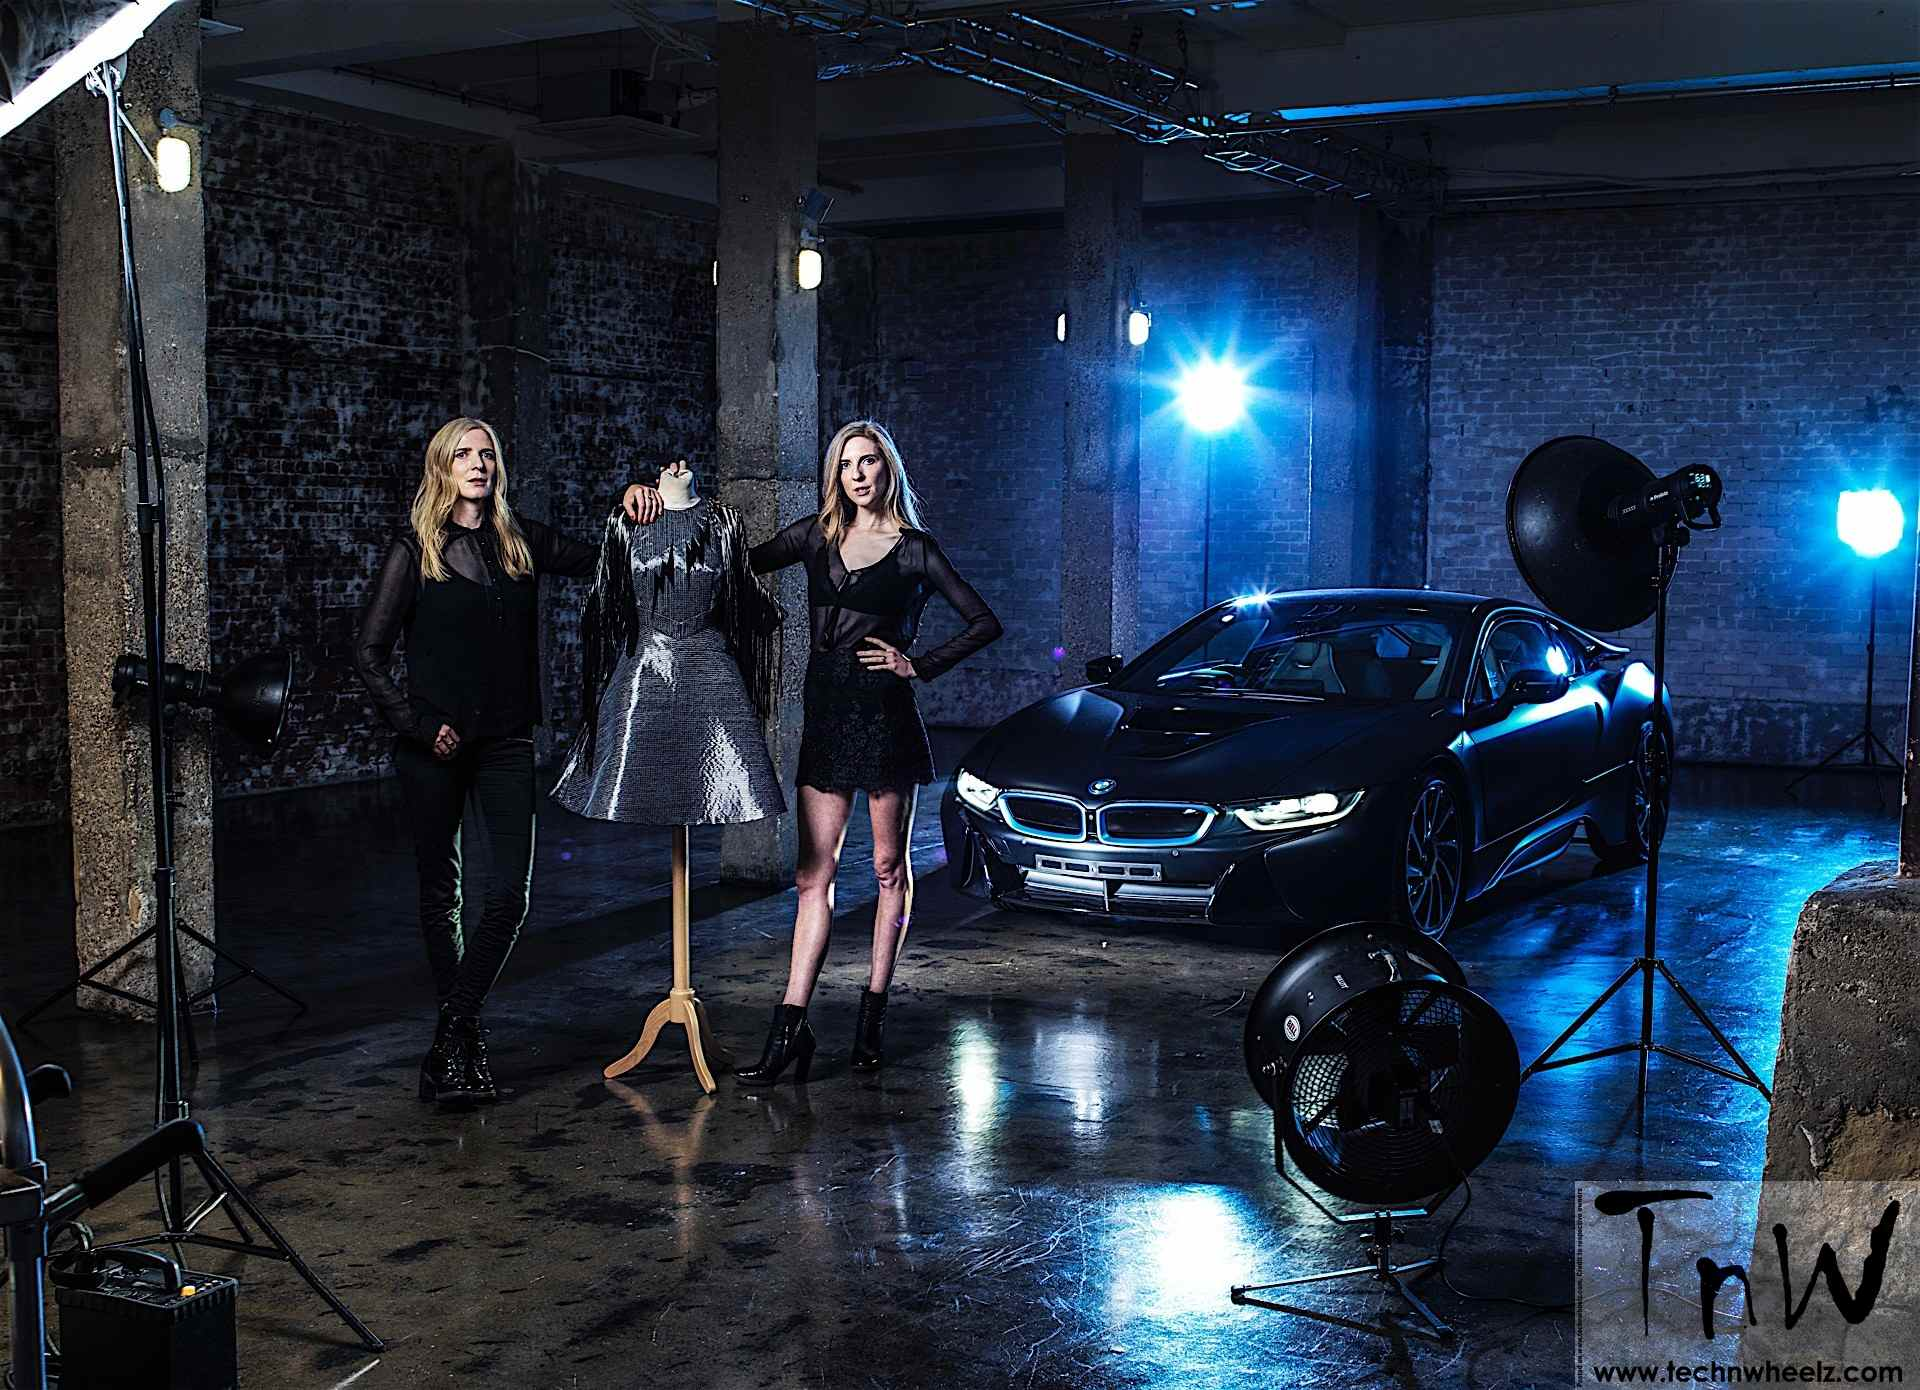 BMW's 'i' brand inspired Carbon fiber dress unveiled by Felder twins